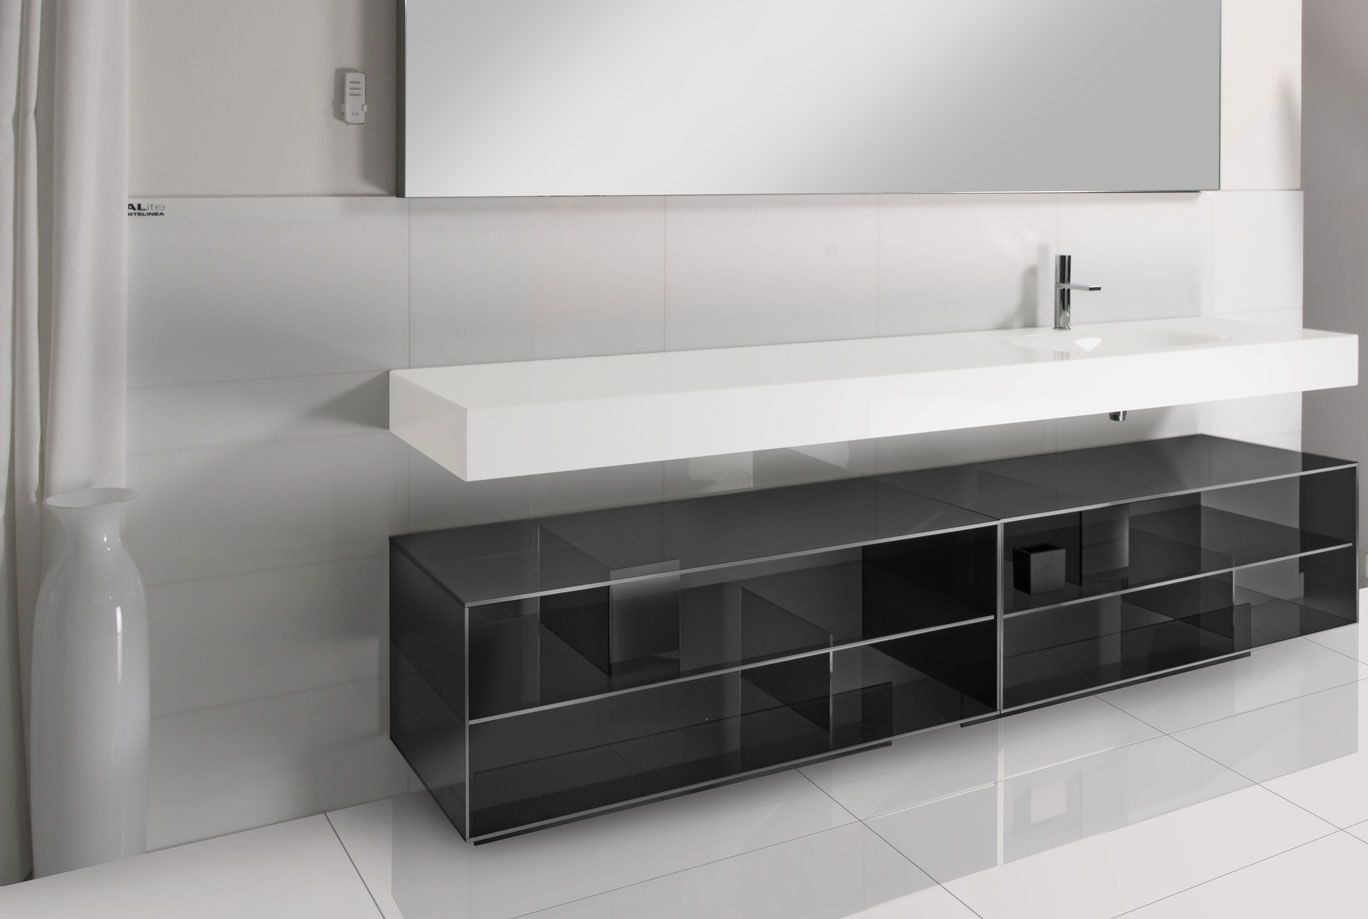 Artelinea Bagno ~ Modern black and white bath vanity by artelinea frammento